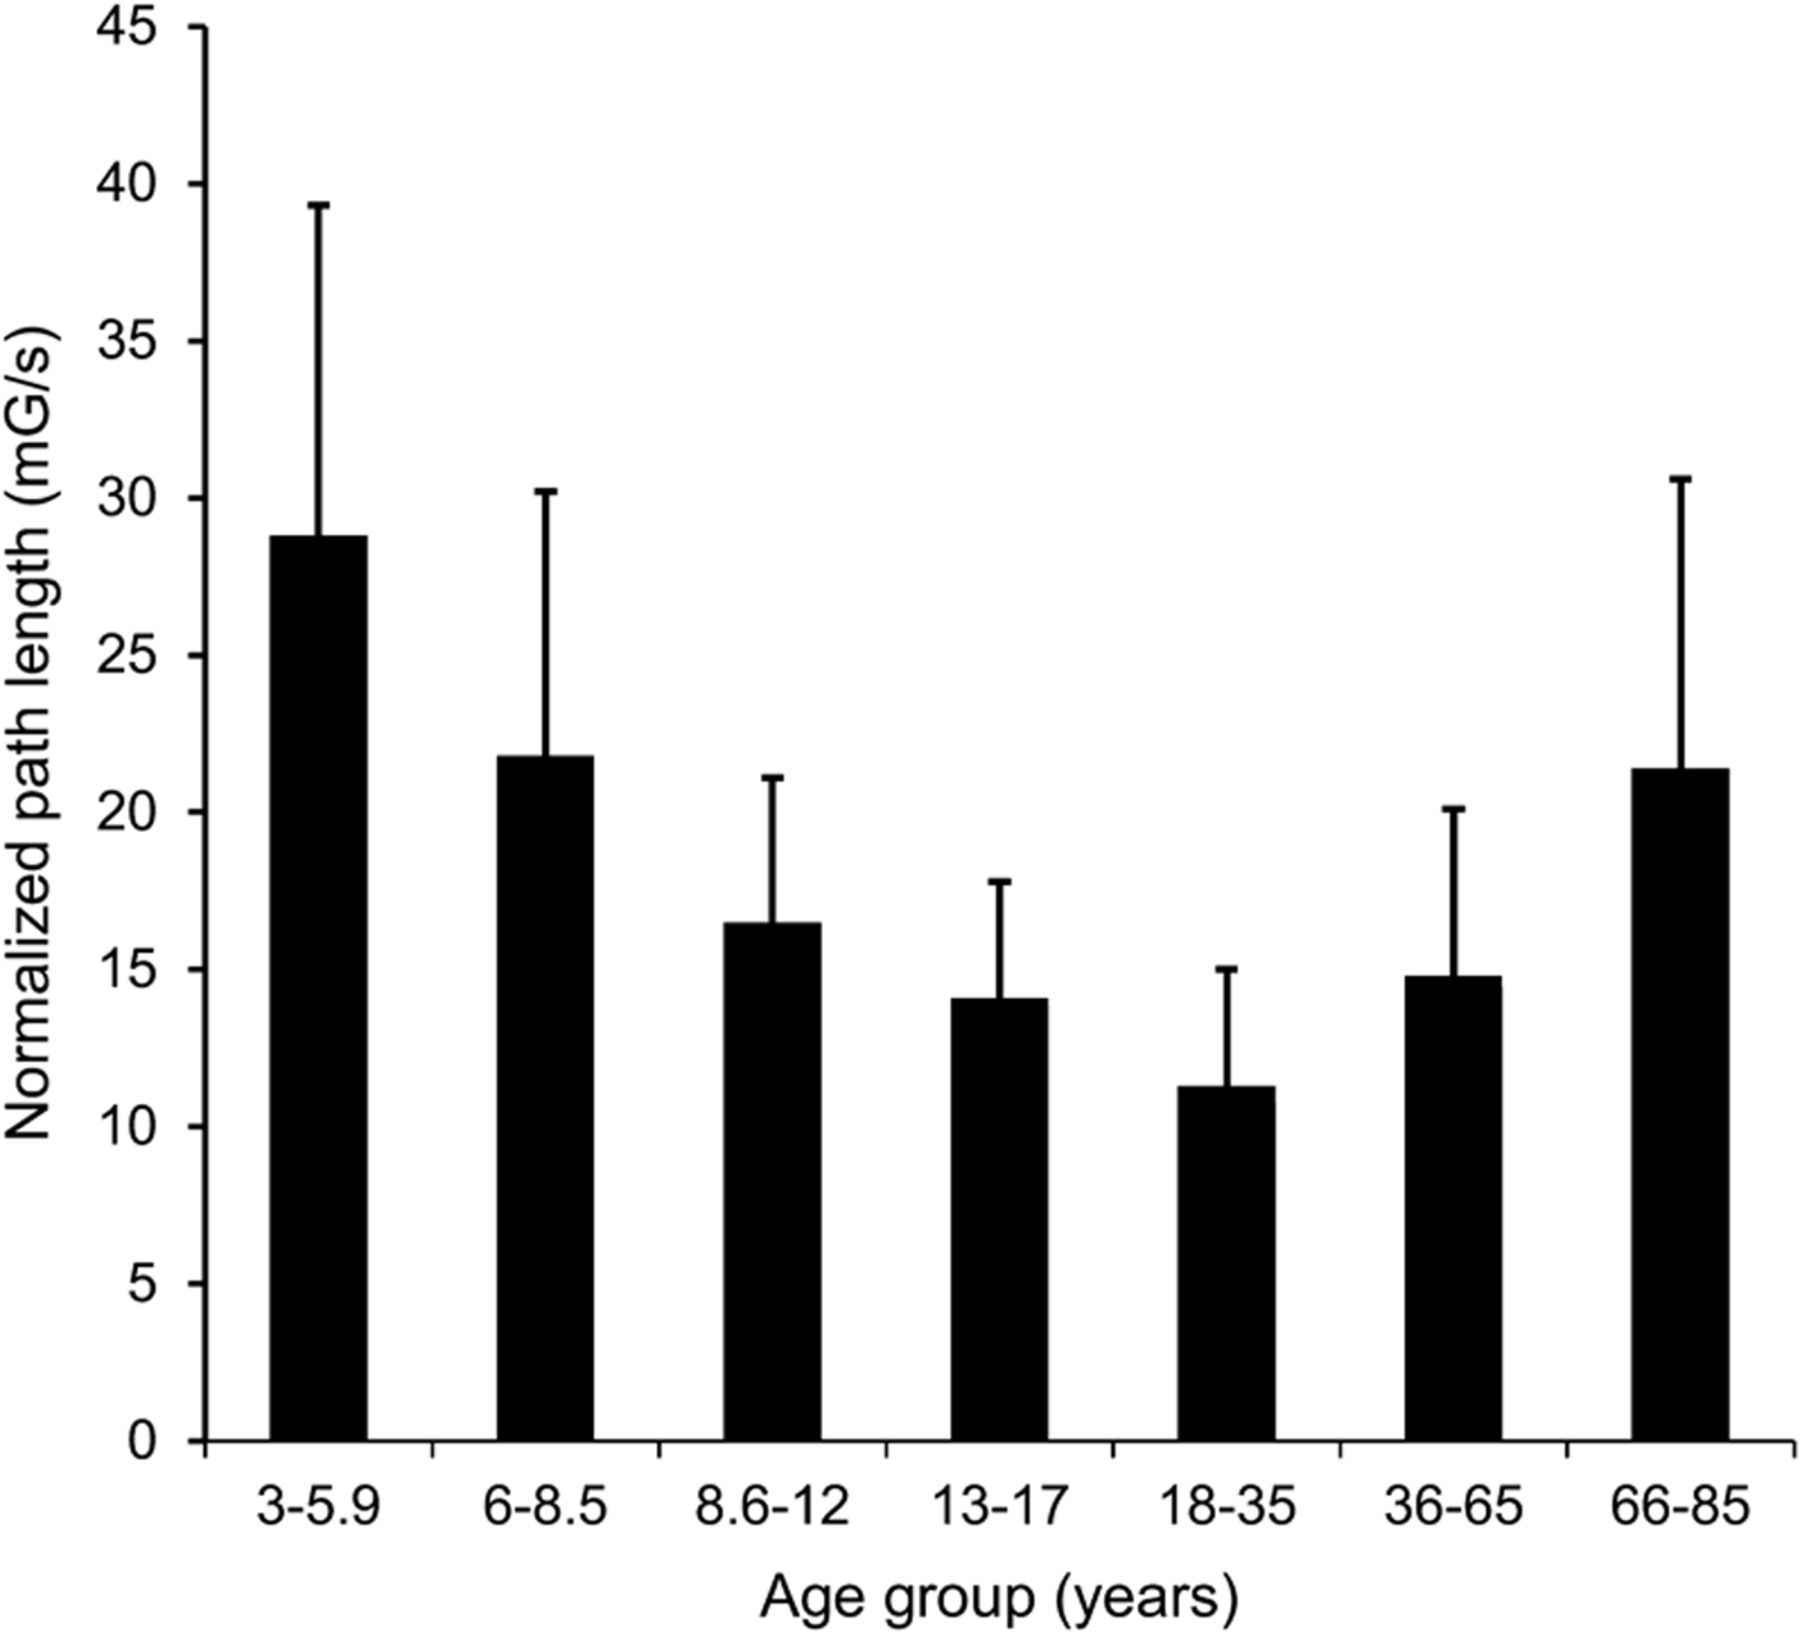 Vestibular function assessment using the NIH Toolbox | Neurology